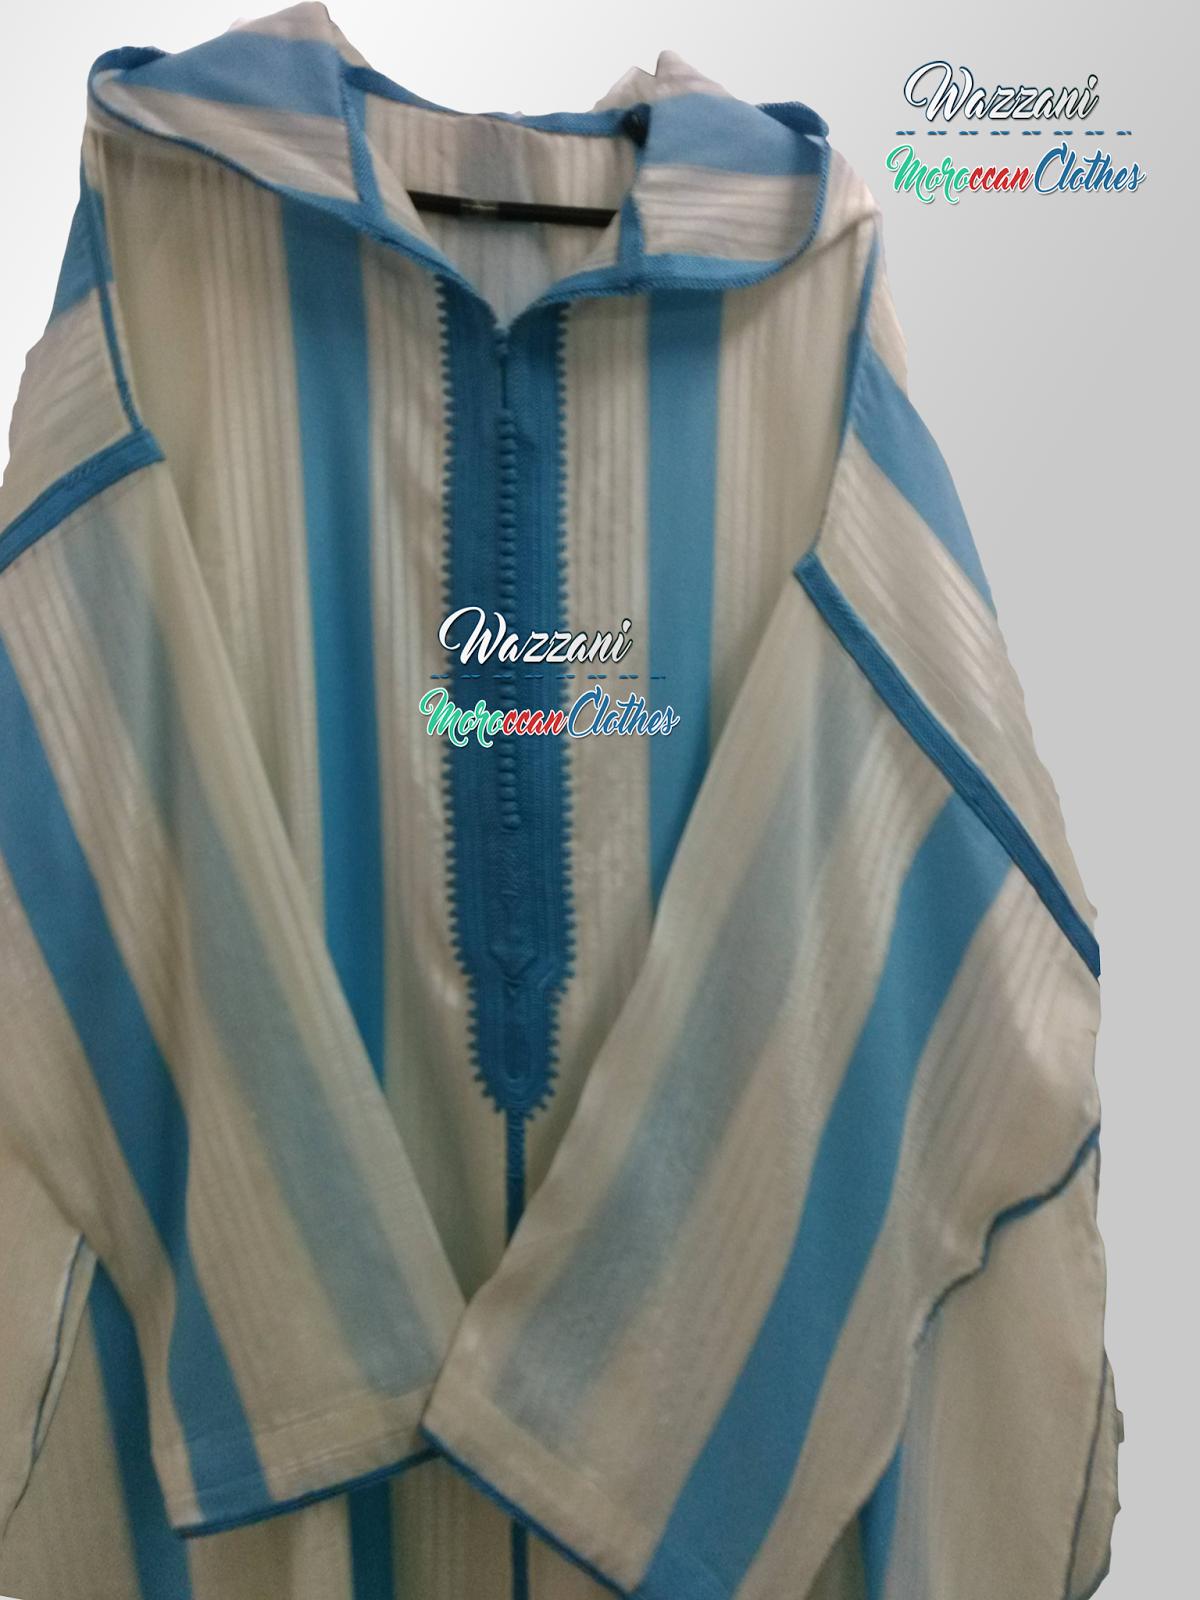 Moroccan Jellaba For Men جلابة مغربية للرجال Moroccan Clothing Fashion Clothes